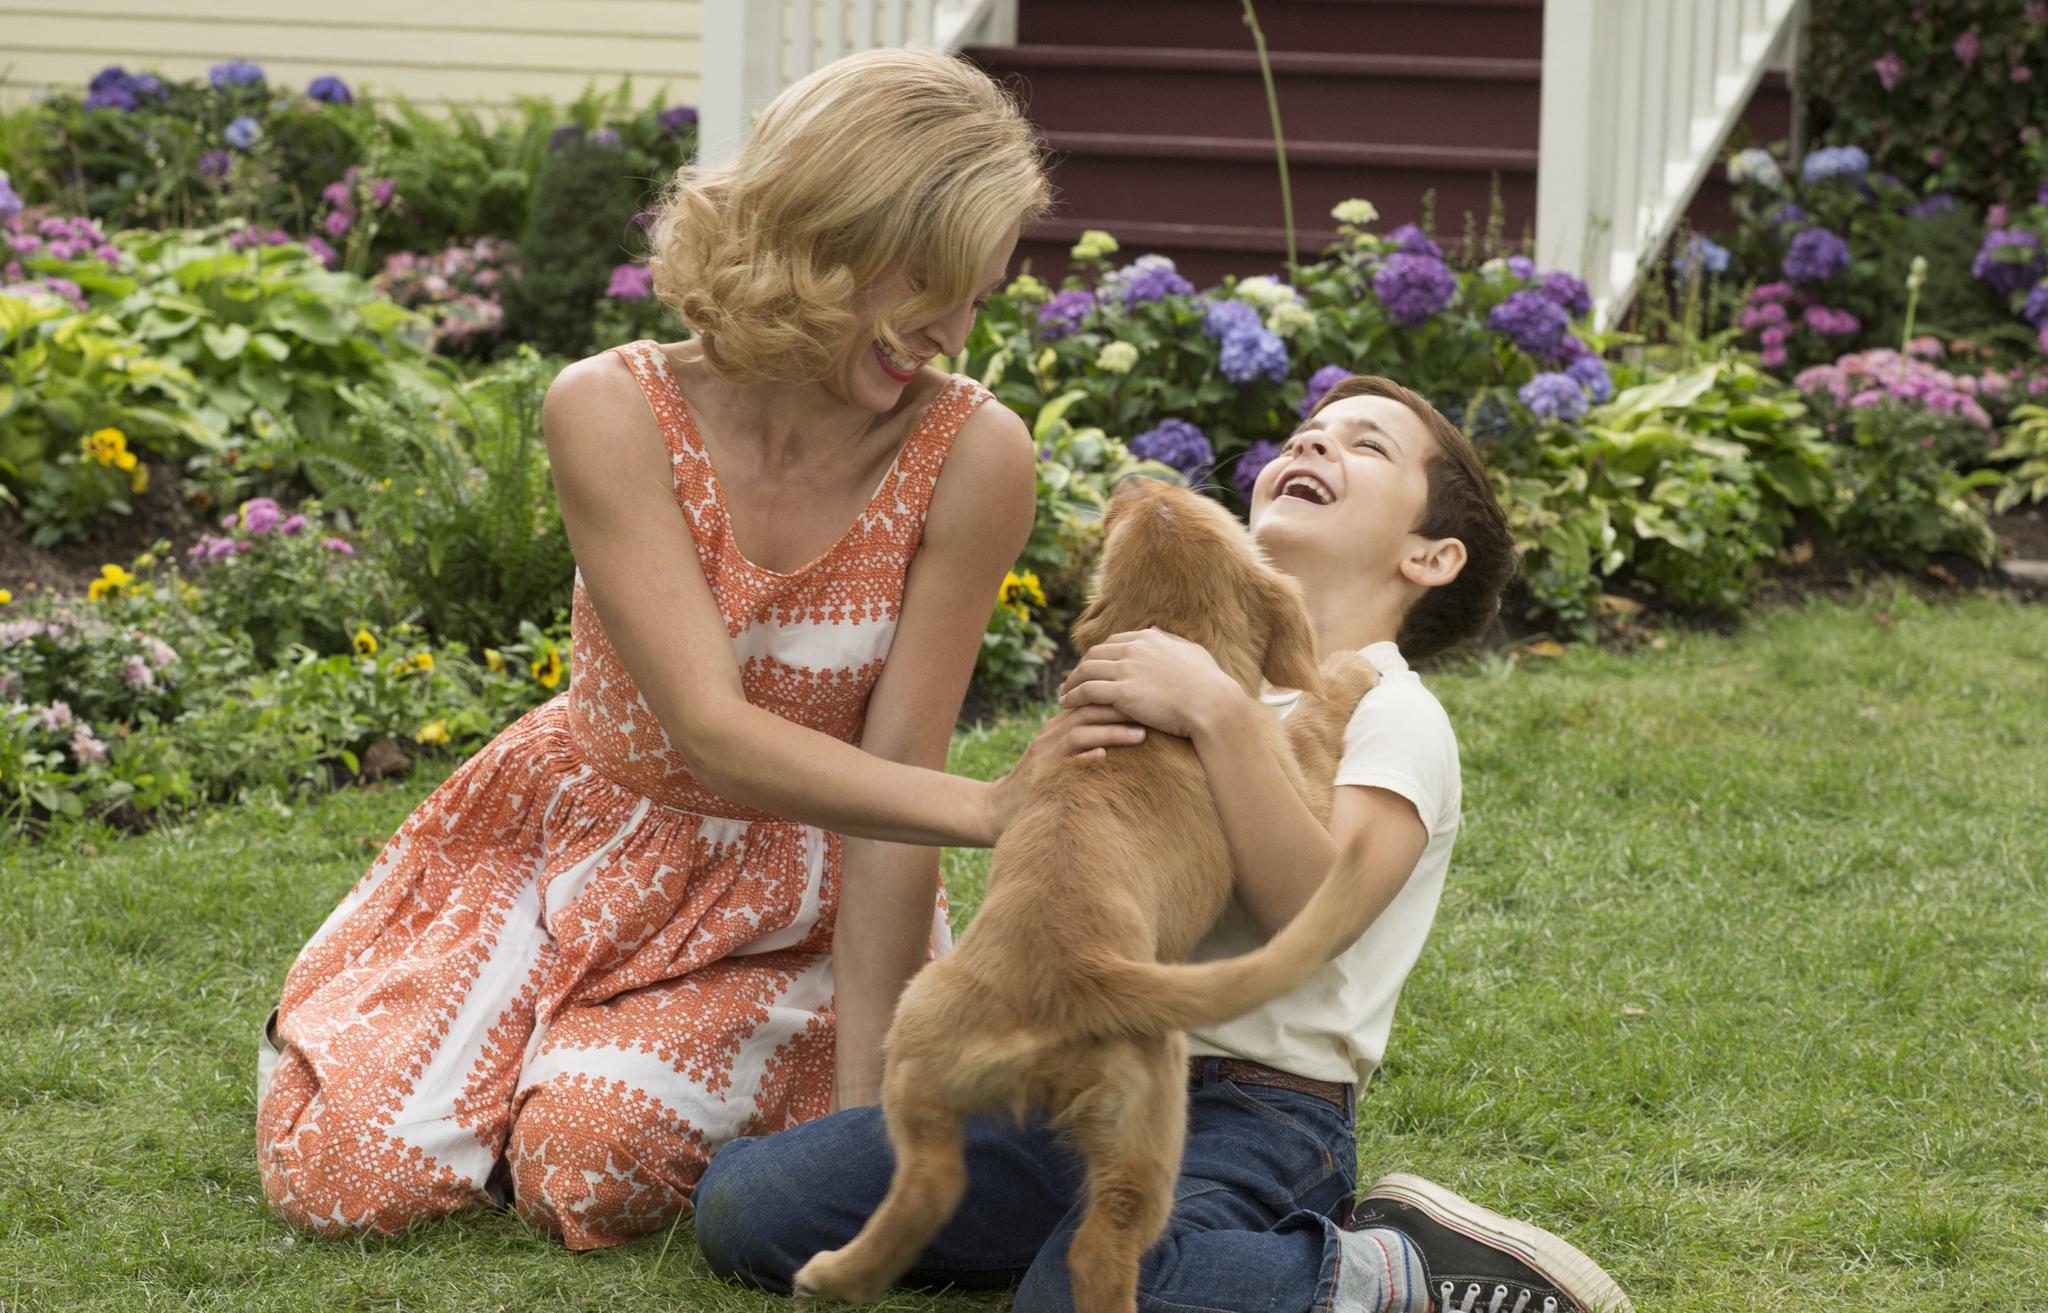 Josh Gad, Juliet Rylance, and Bryce Gheisar in A Dog's Purpose (2017)